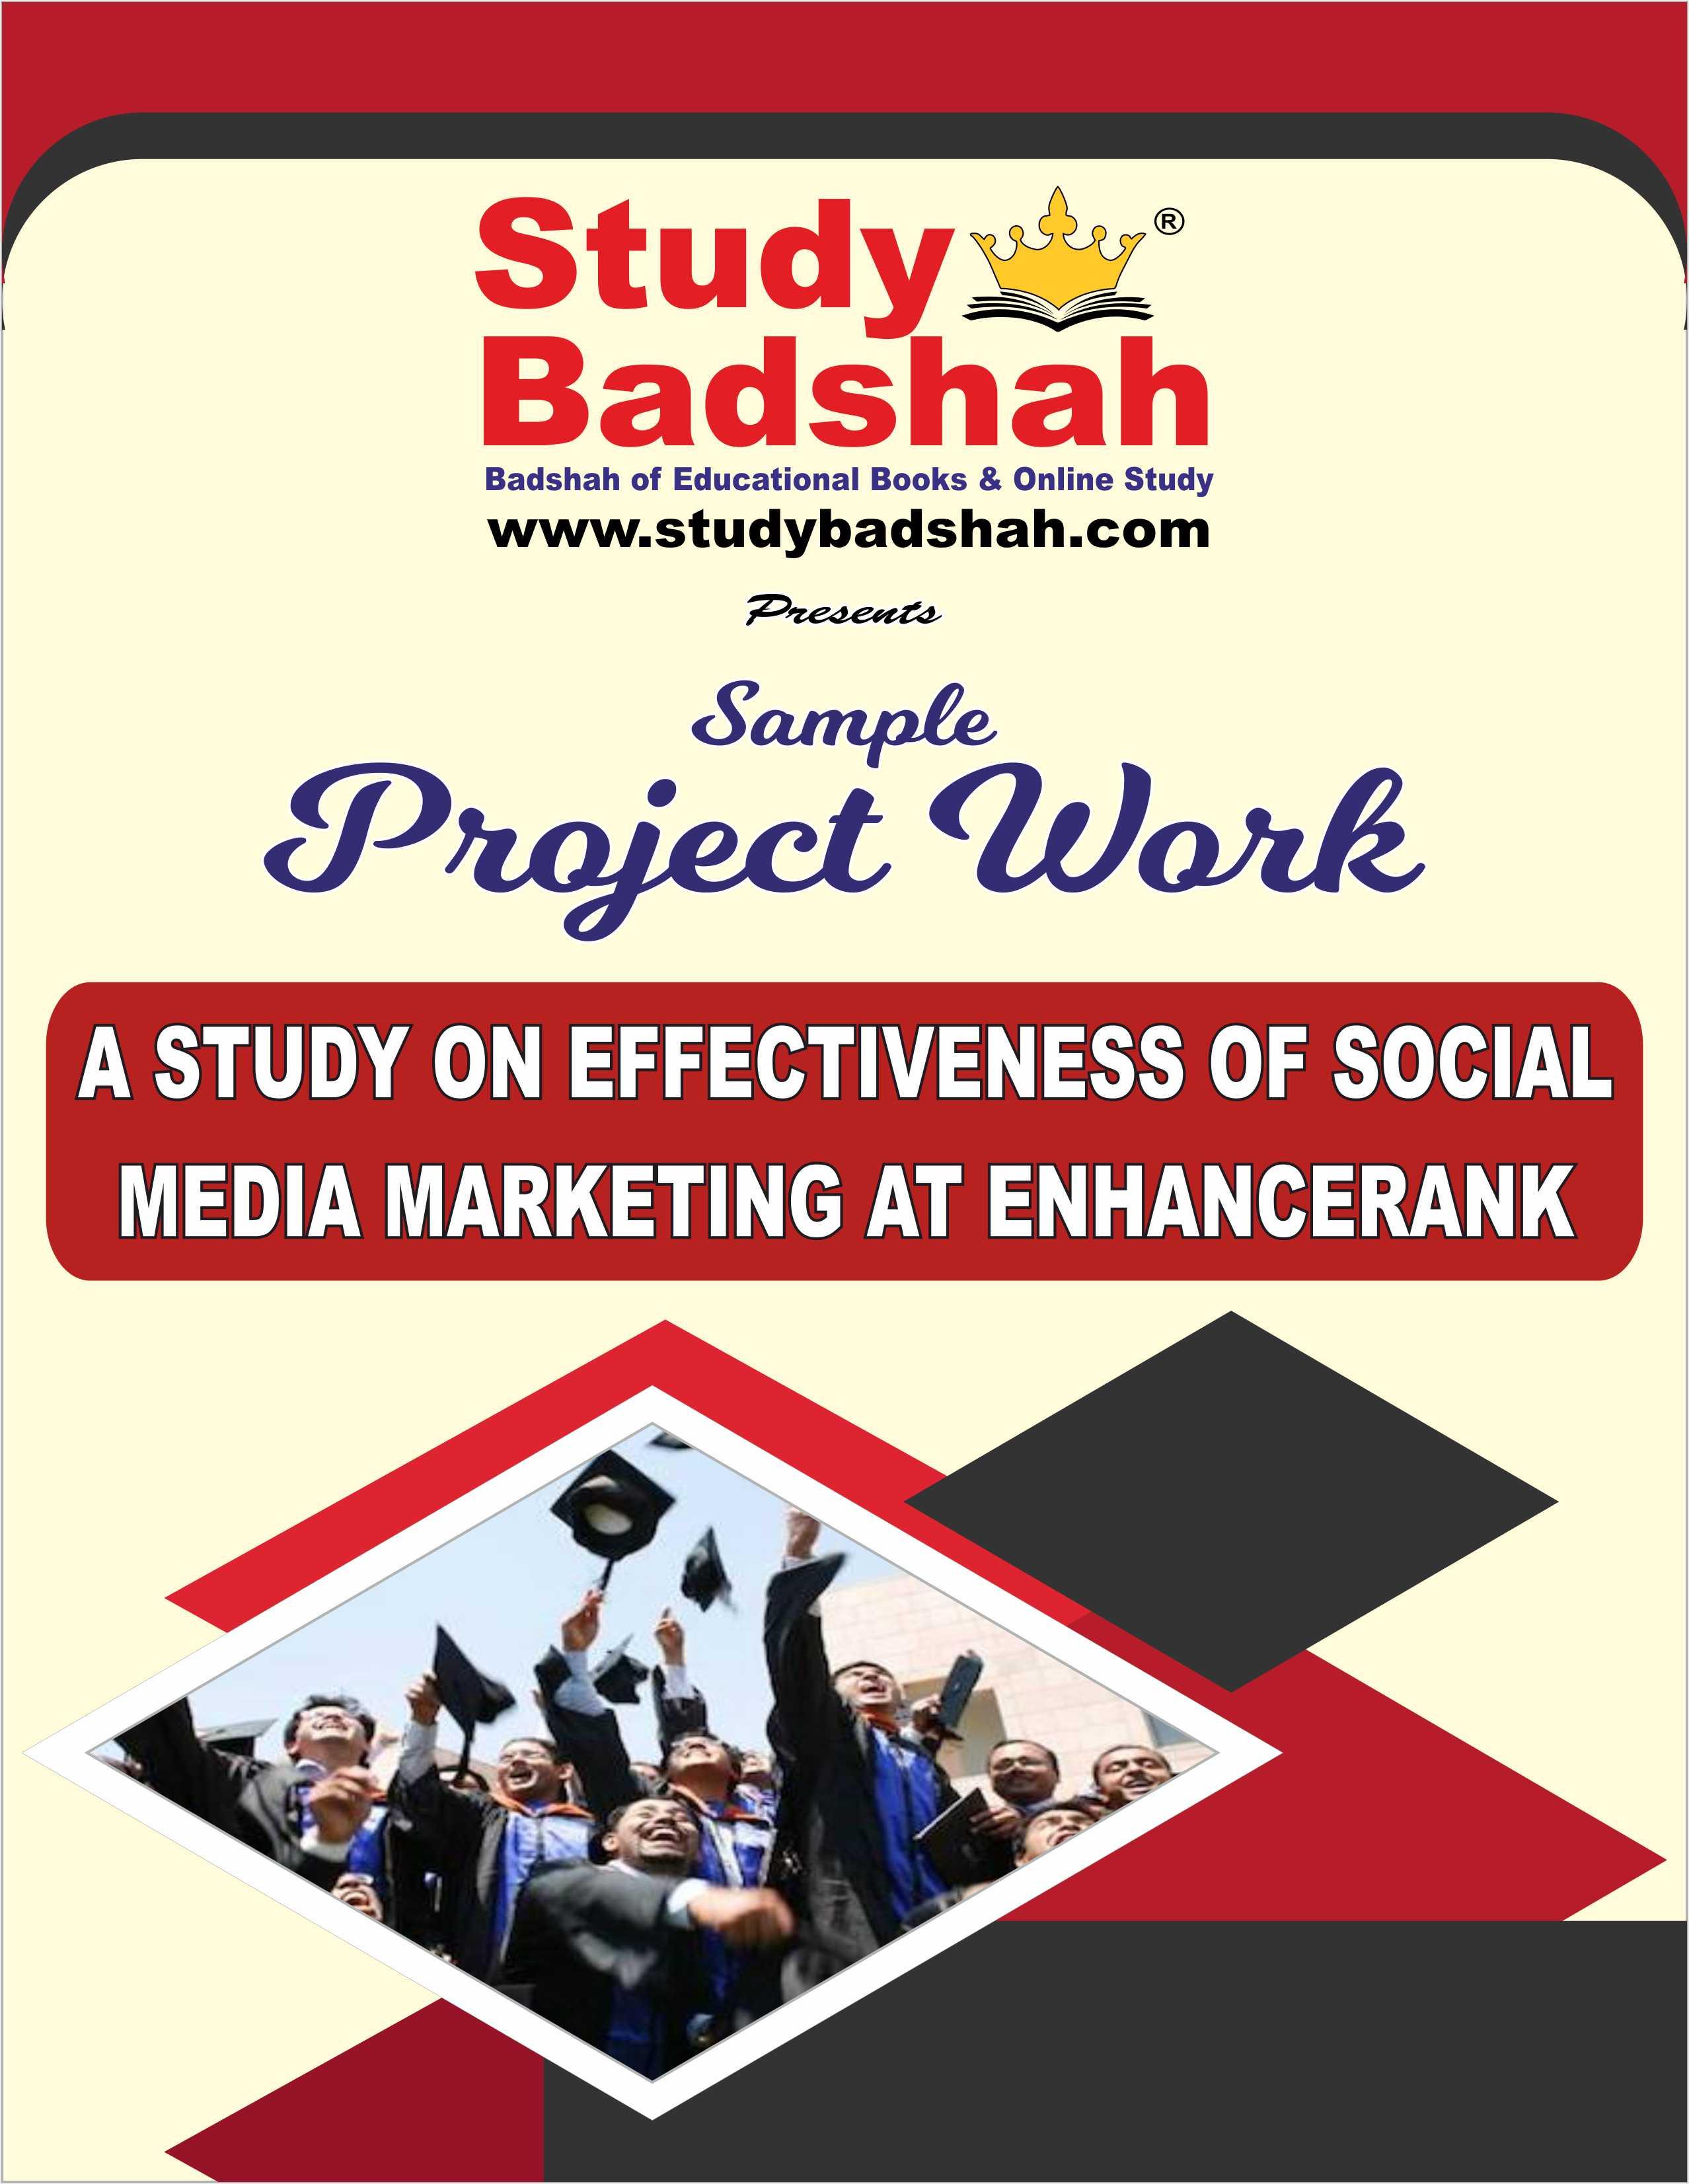 A STUDY ON EFFECTIVENESS OF SOCIAL MEDIA MARKETING AT ENHANCERANK